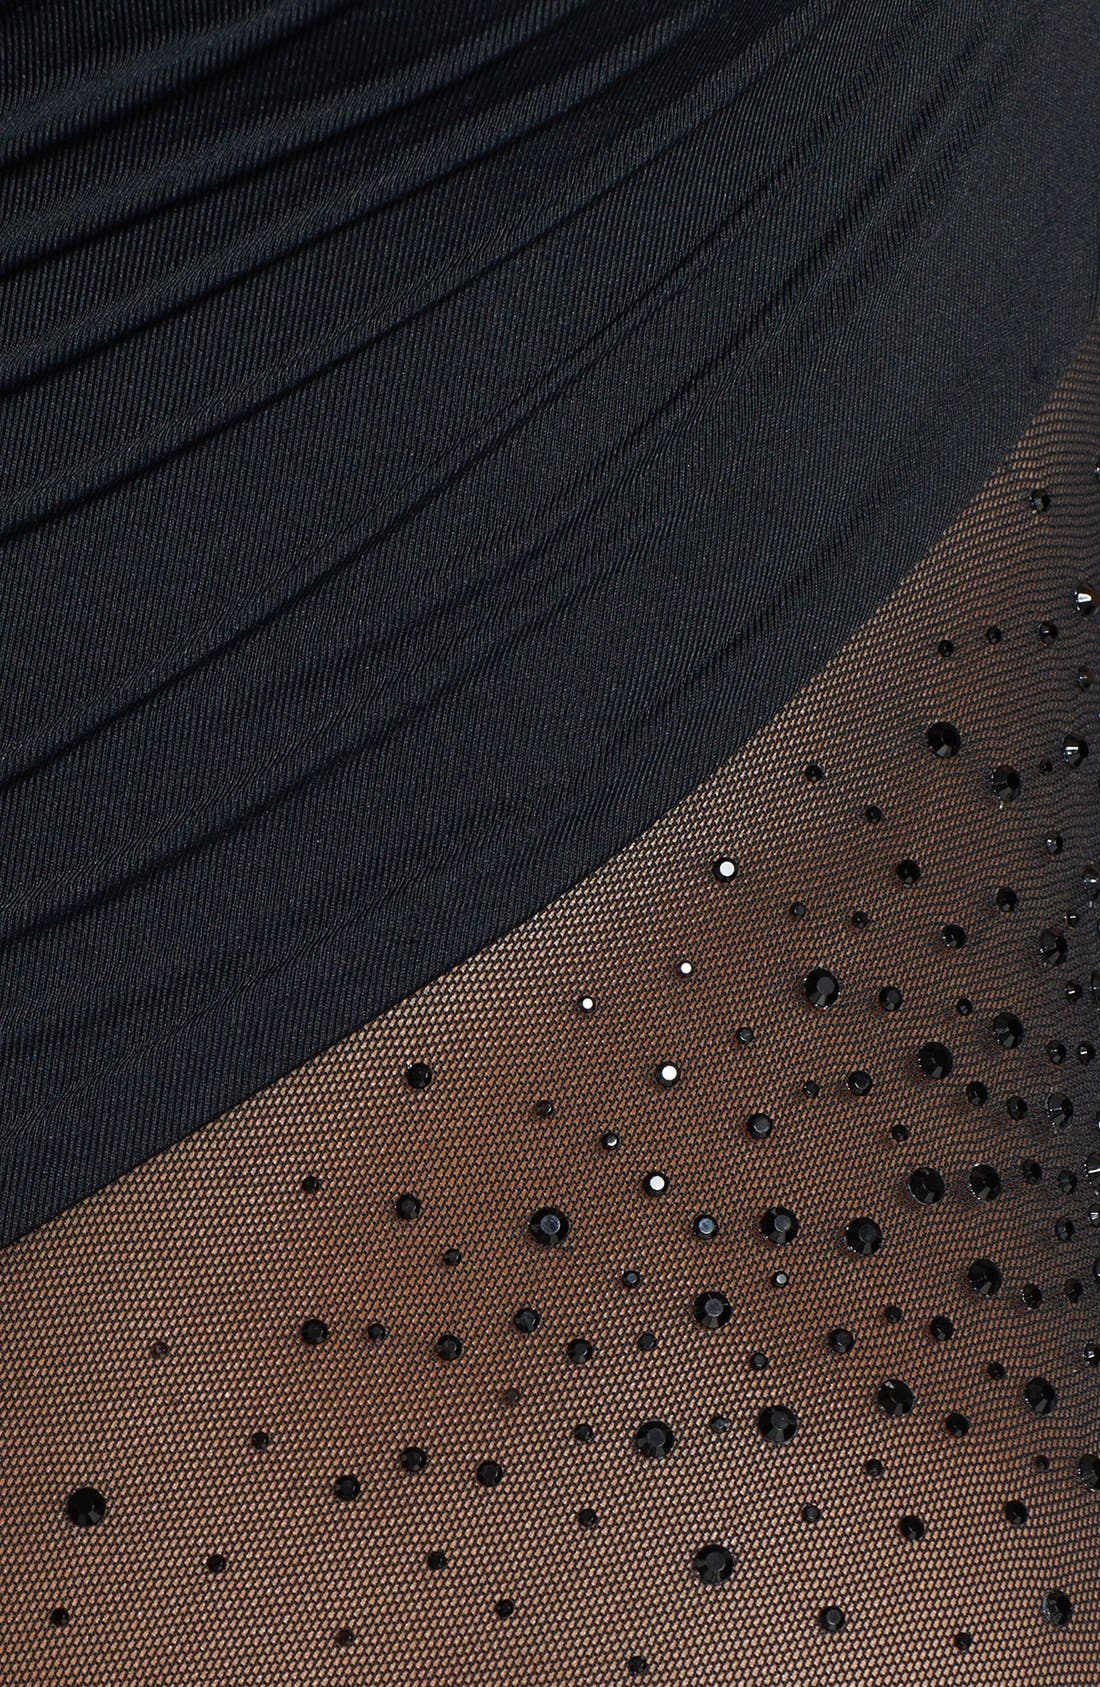 Carmen Marc Valvo 'Exotic Illusion' Rhinestone One-Piece Swimsuit,                             Alternate thumbnail 3, color,                             002